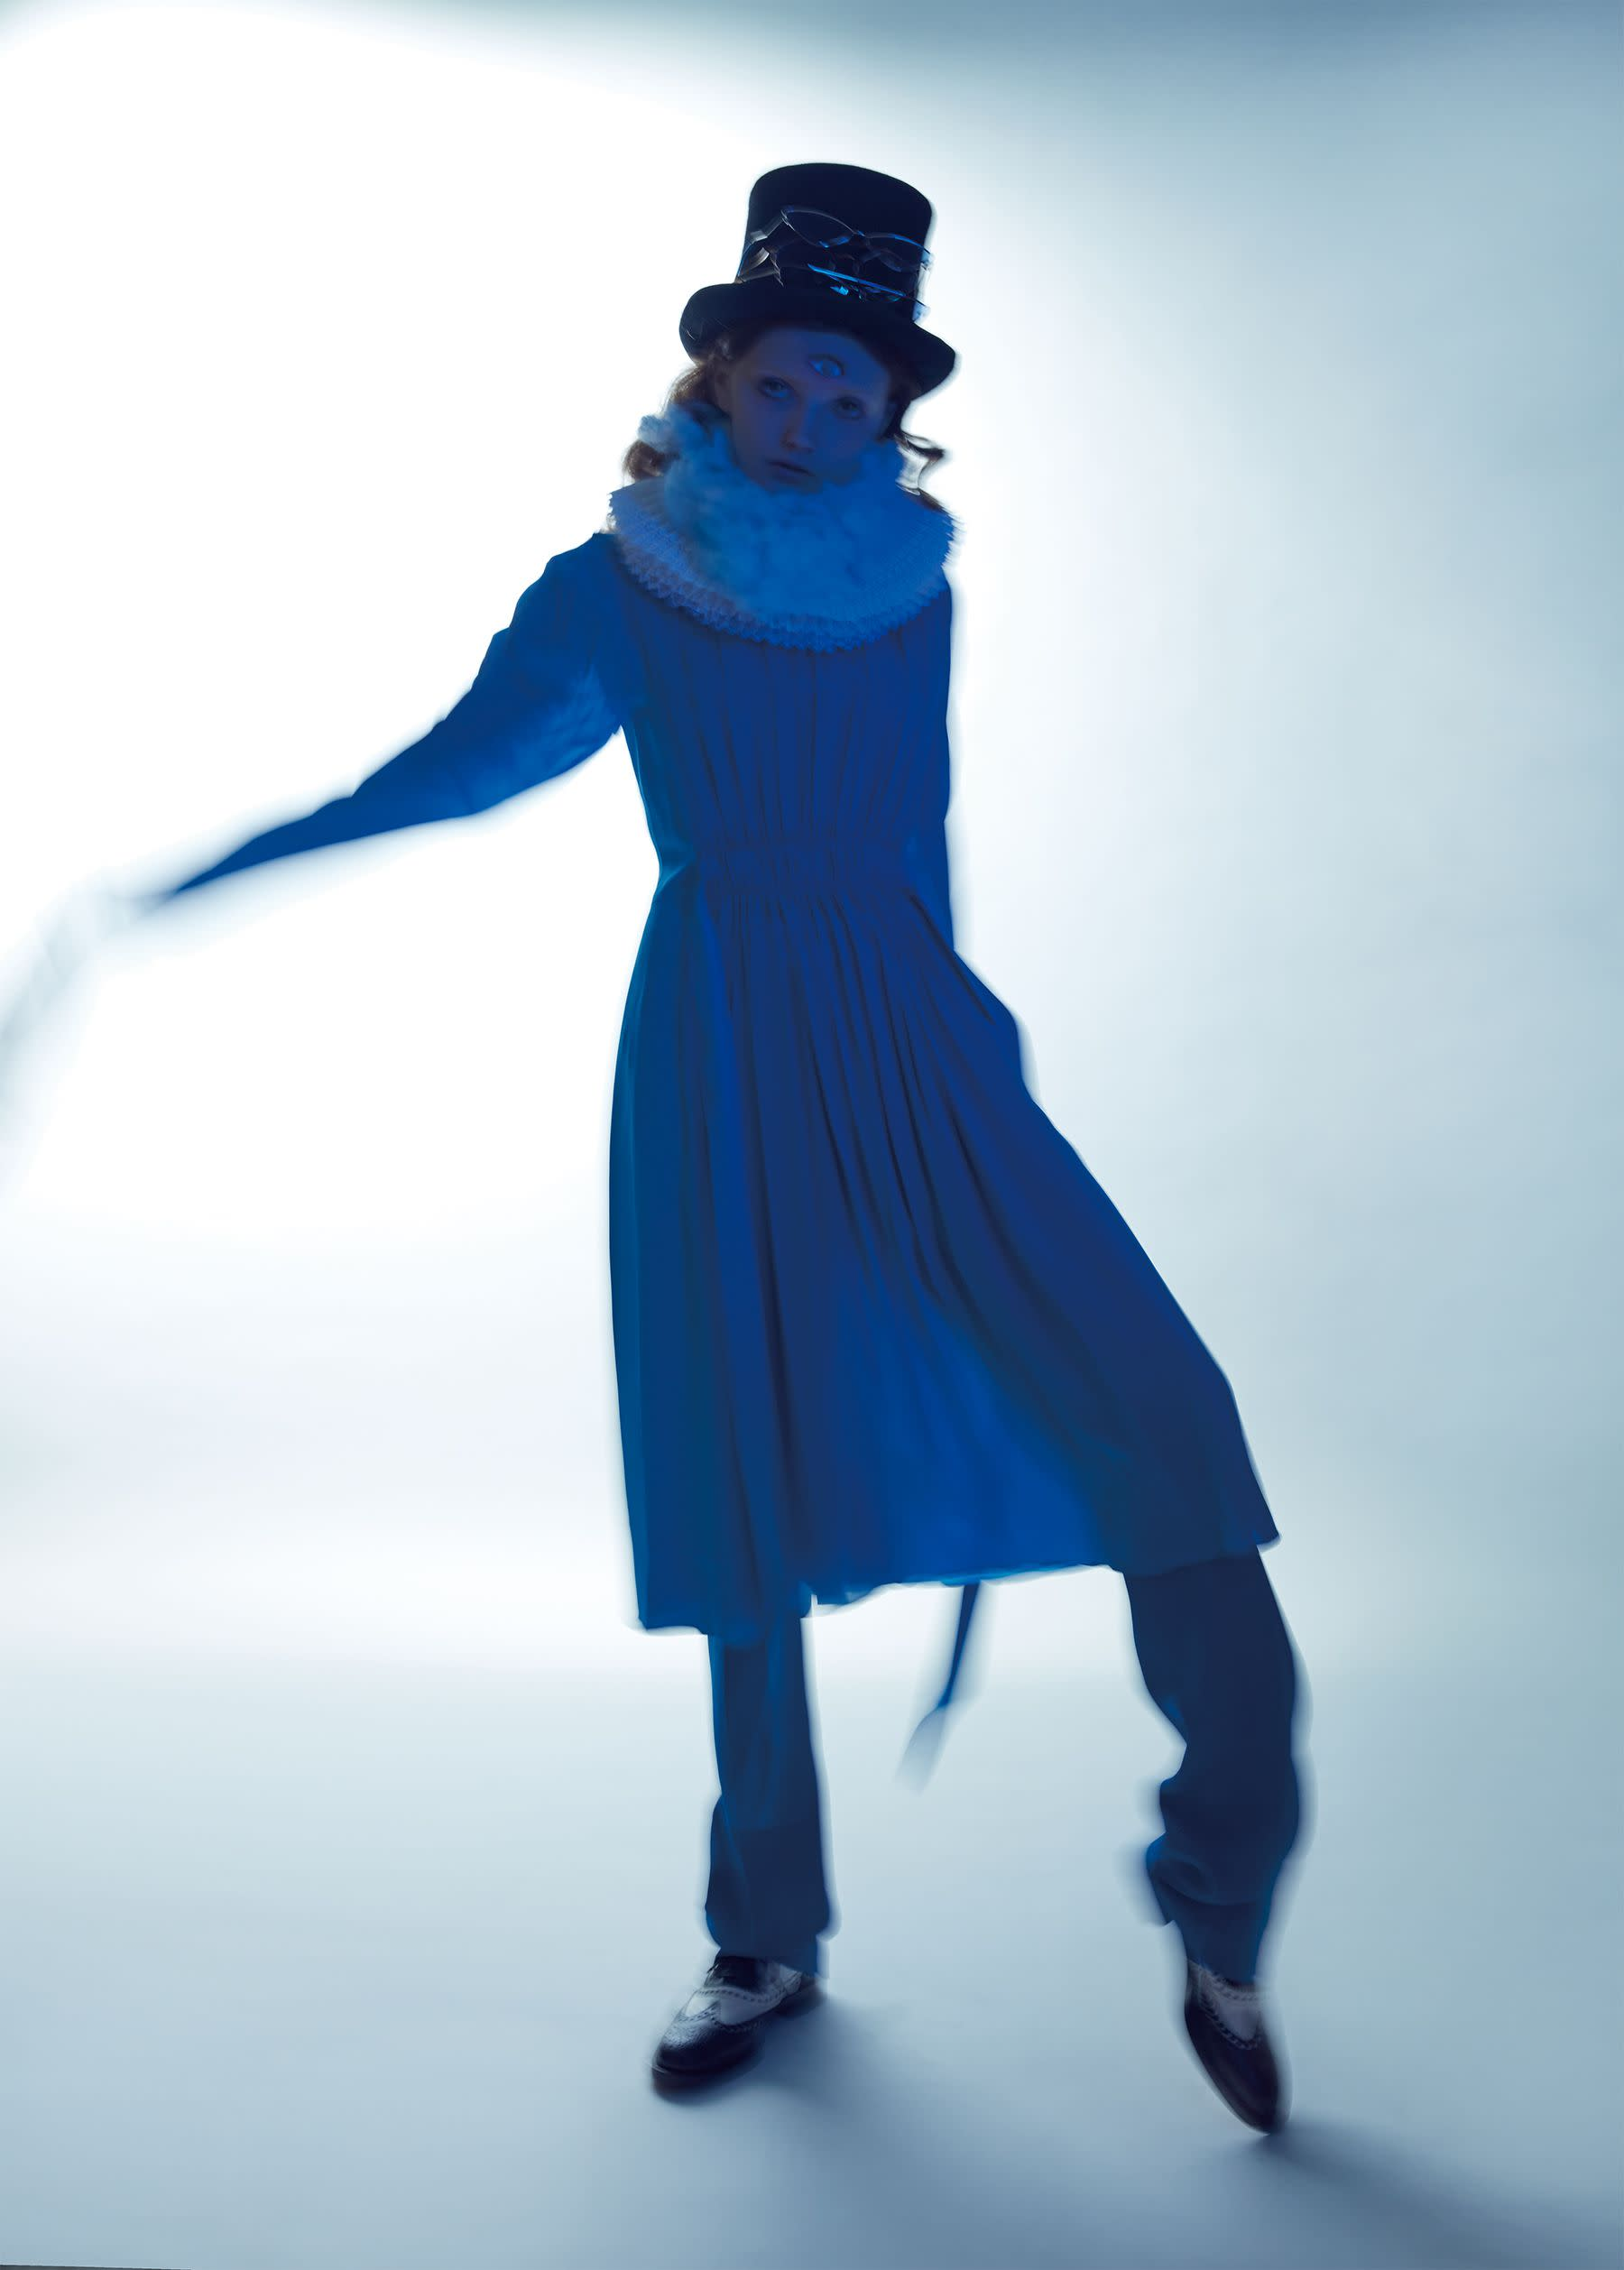 洋裝,Louis Vuitton;長褲,Michael Kors;皮鞋,Dior;眼鏡,Spektre。